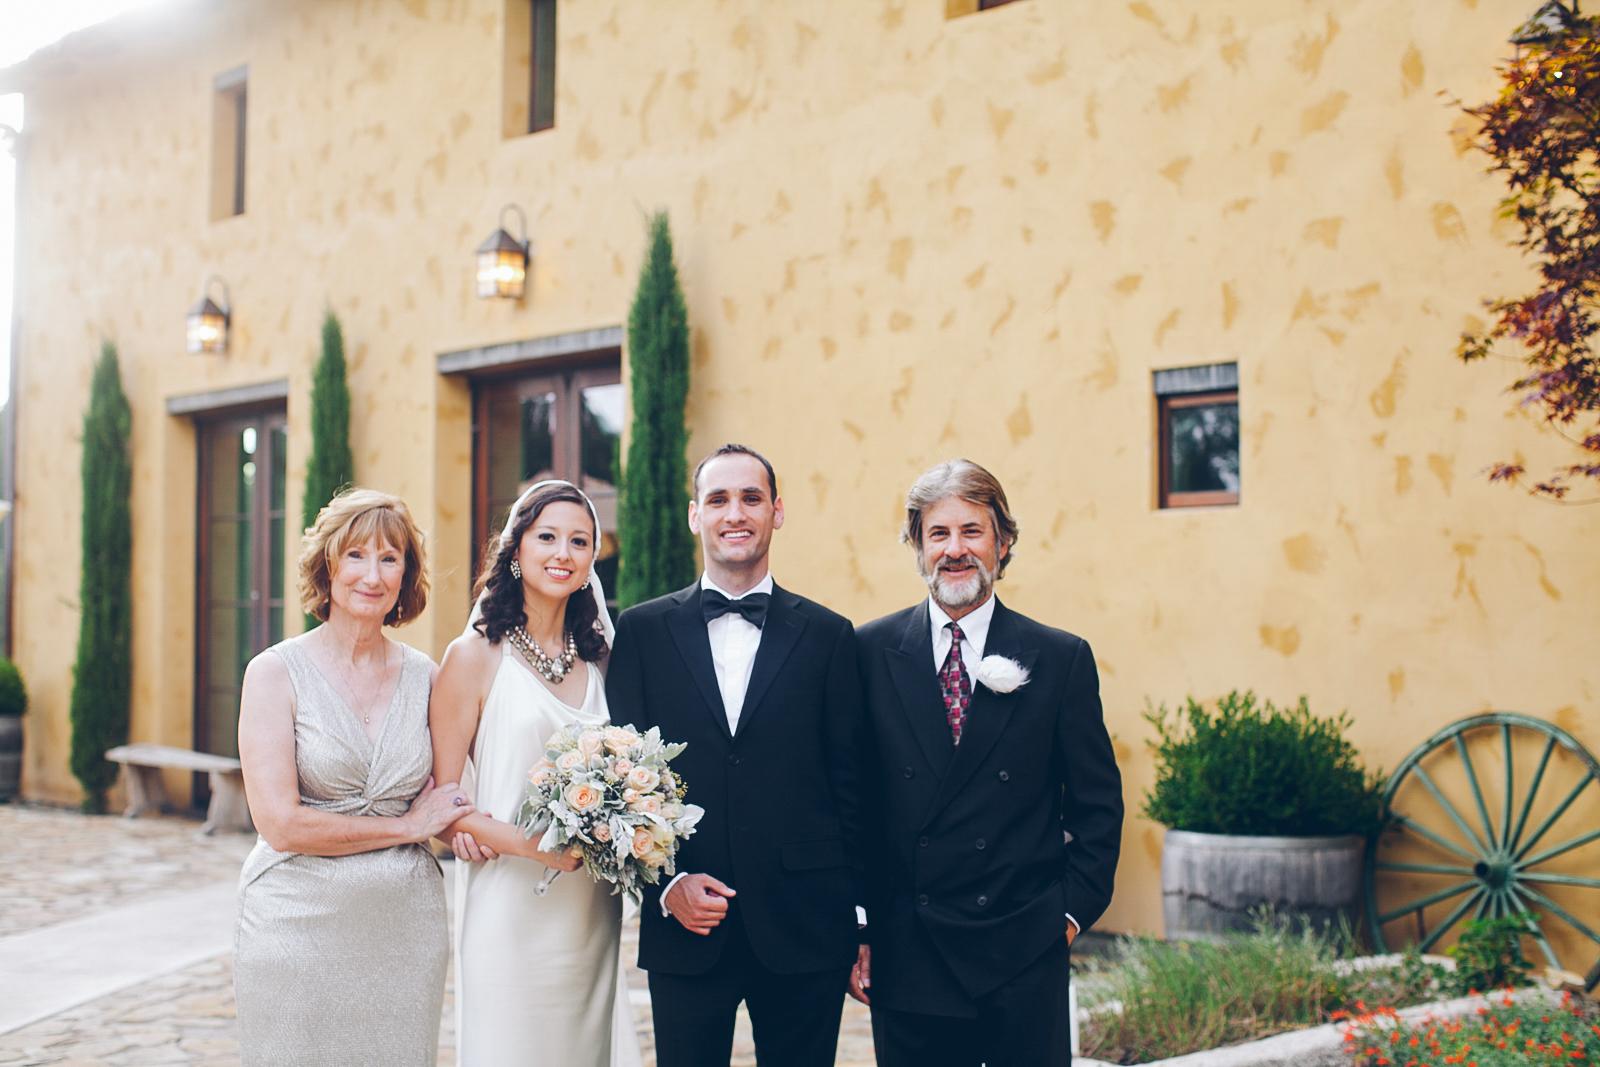 miraflores_winery_wedding_photography_ian_melissa_ebony_siovhan_bokeh_photography_37.jpg